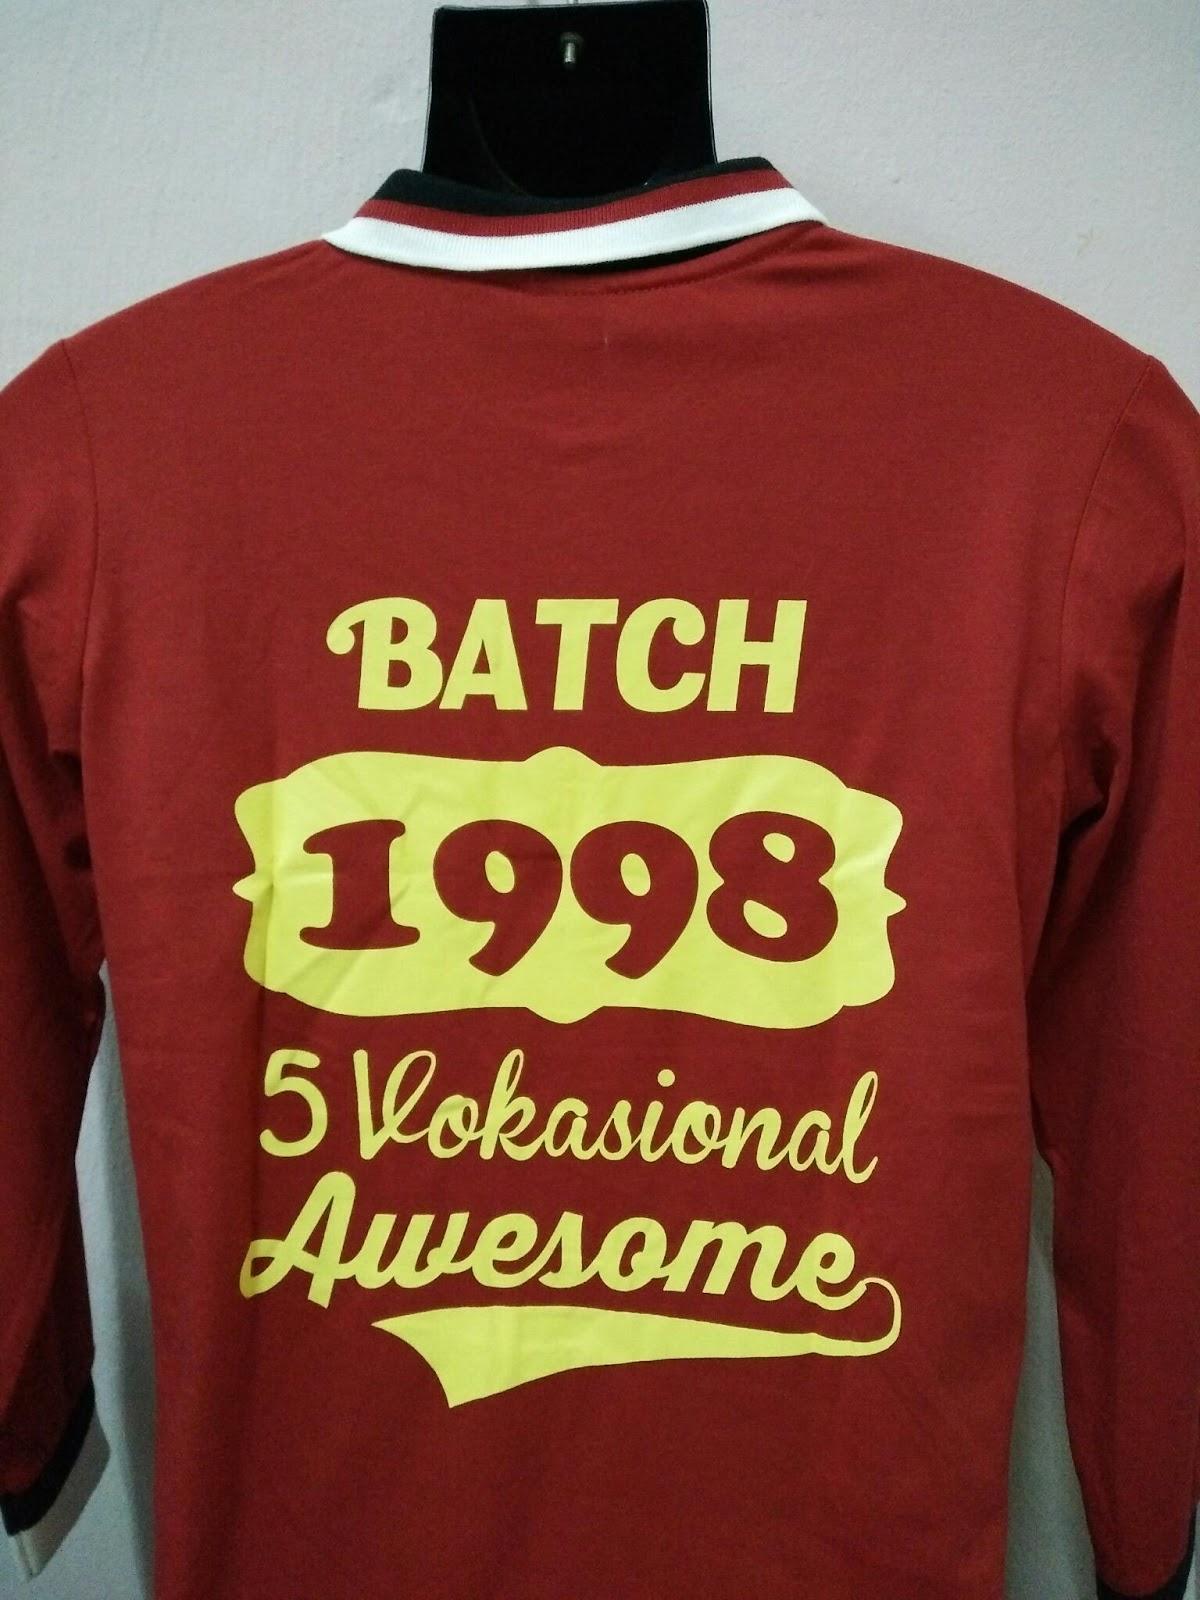 Design baju t shirt kelas - Tempahan Tshirt Kelas Batch 1998 5 Vokasional Awesome Your Design We Do Qty 25 Helai Untuk Tempahan Tshirt Printing Hubungi Kami